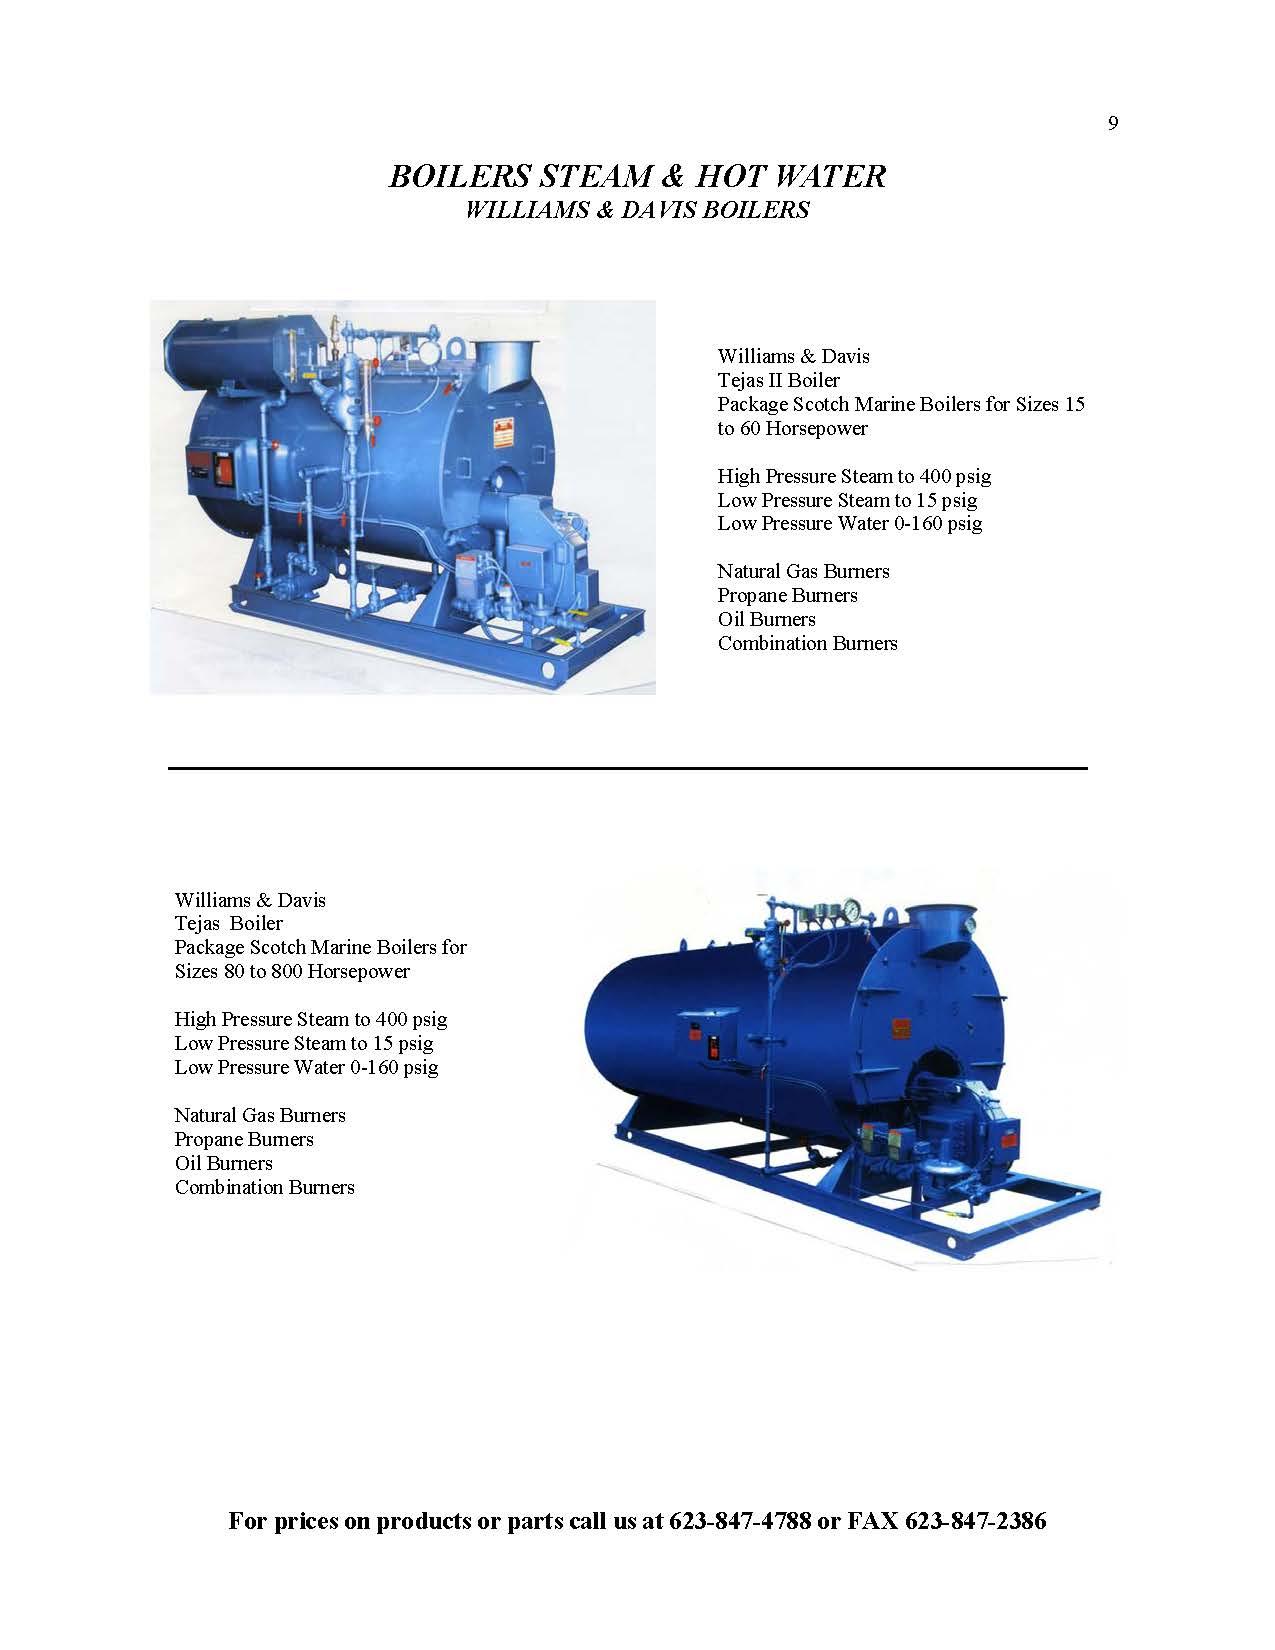 Steam Boiler Parts And Function Dolgular